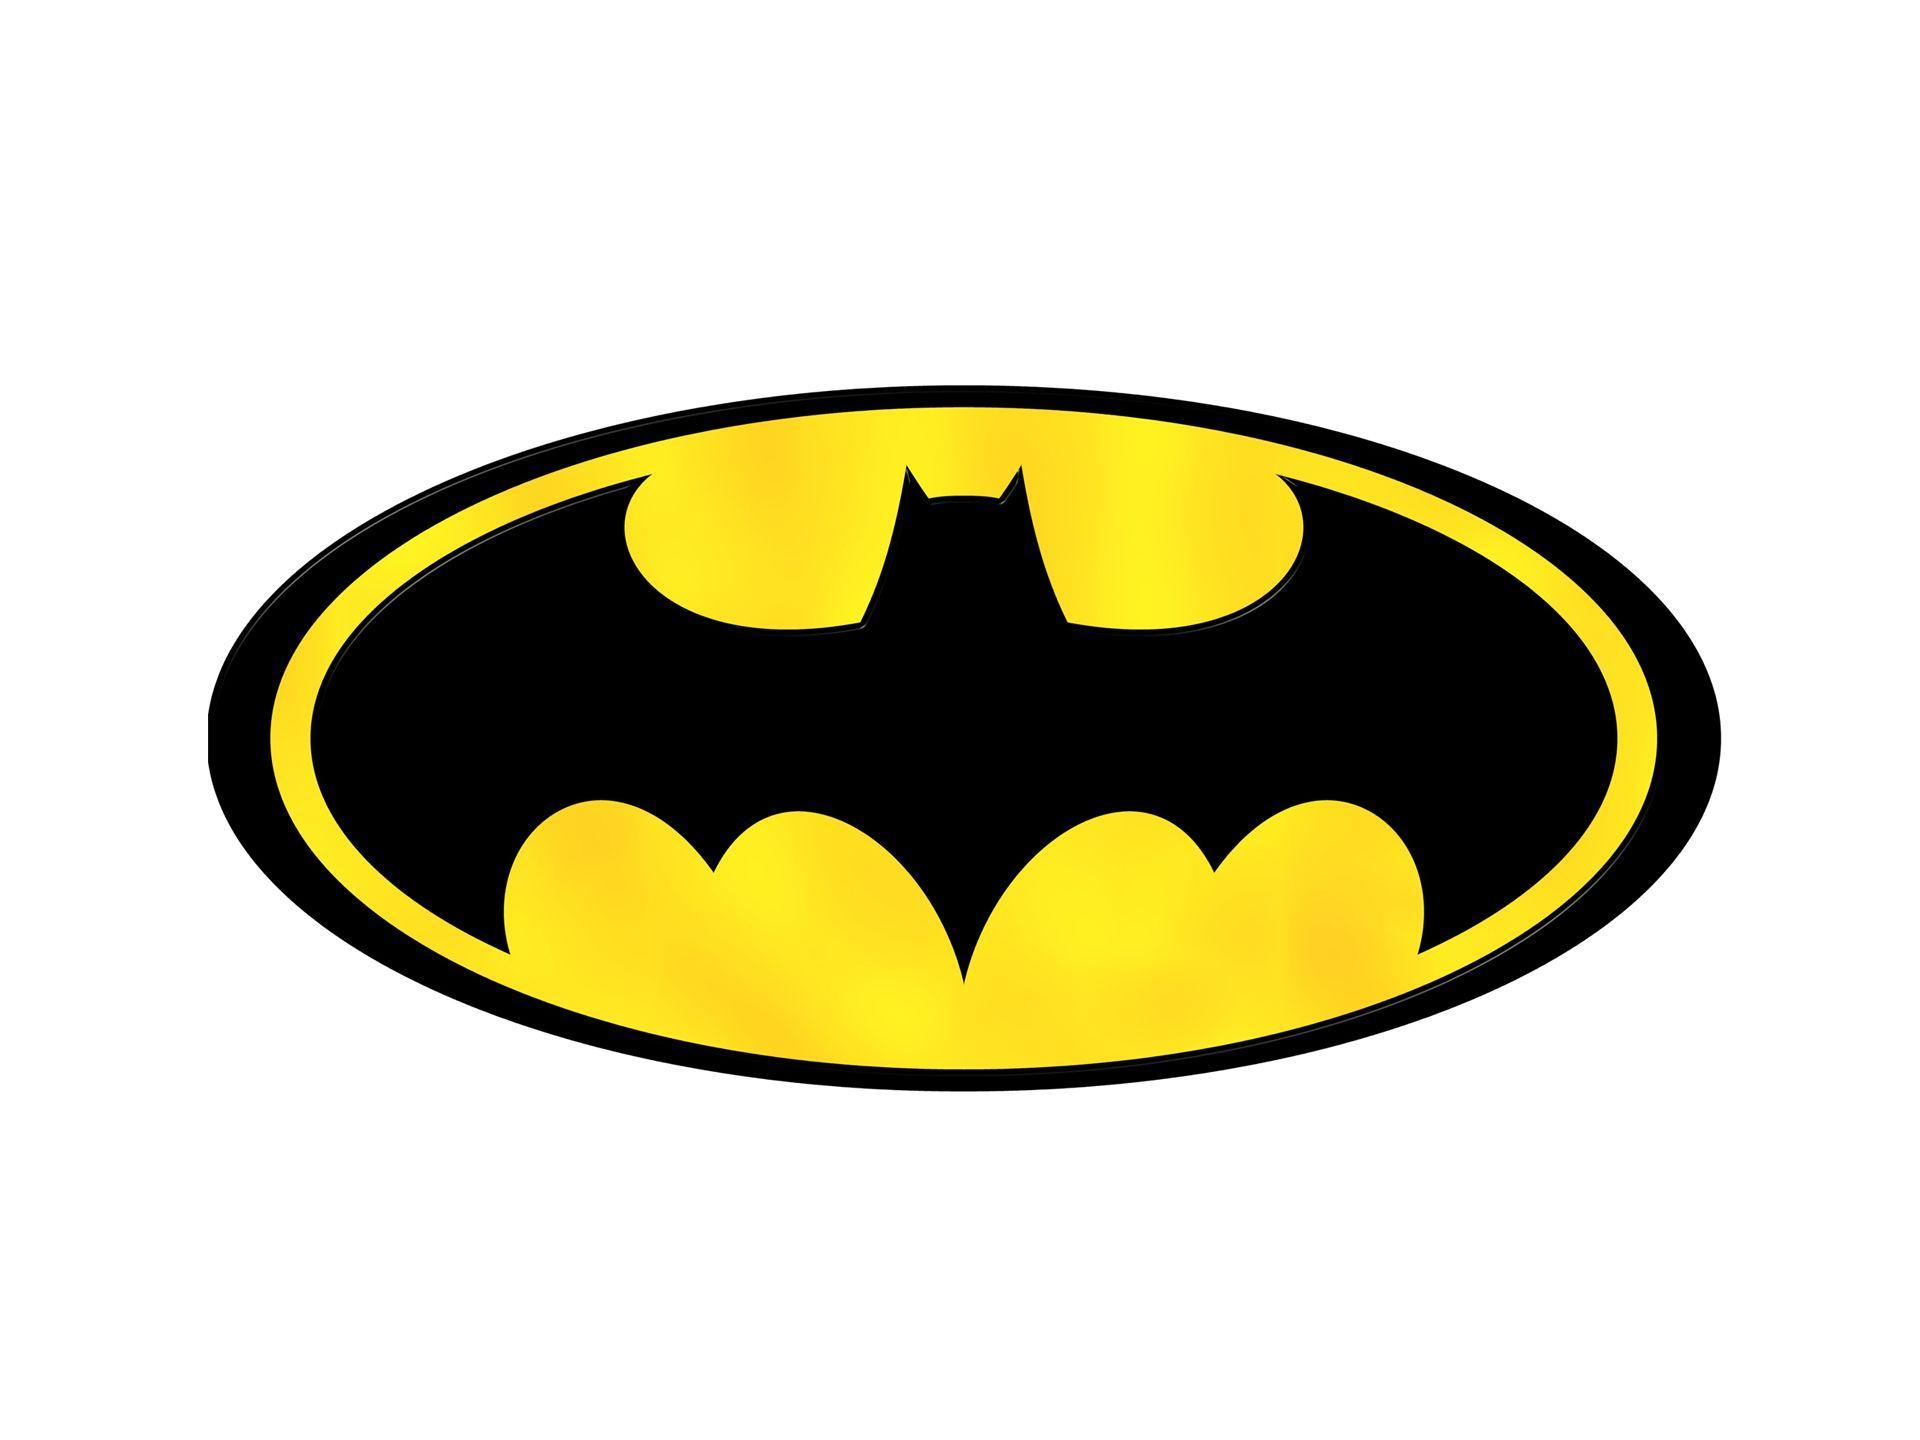 vAzn4Y0 Top Result 69 Unique Batman Logo Cake Template Photos 2017 Zzt4